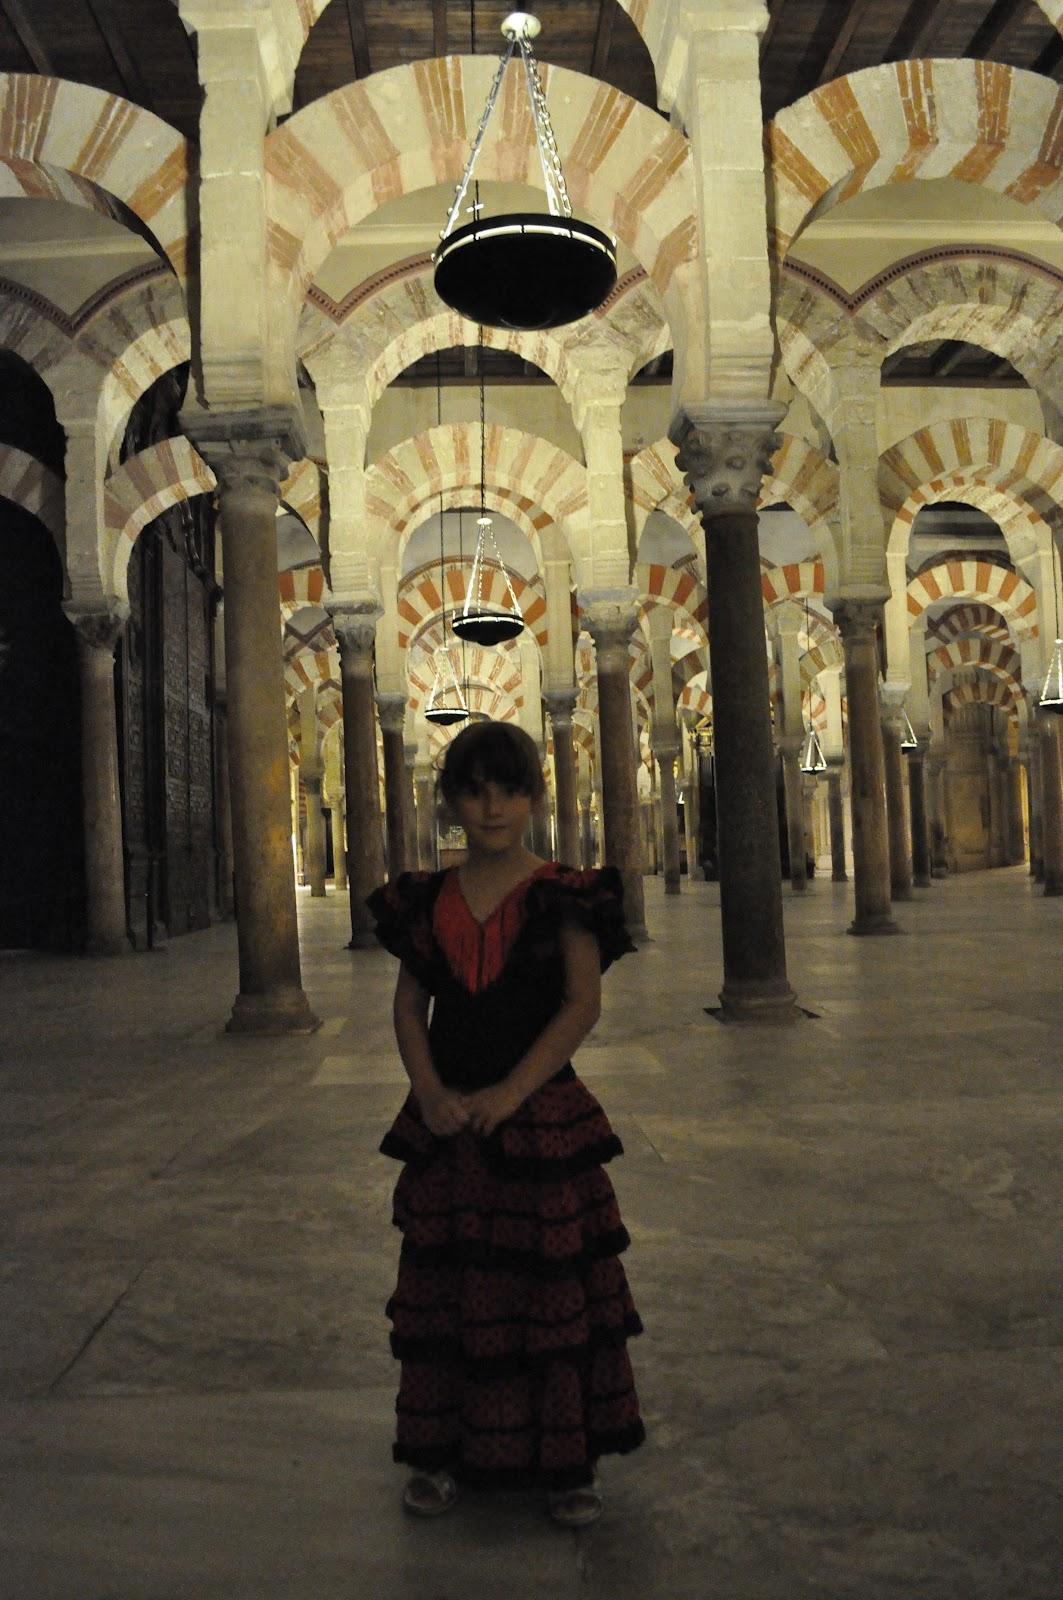 Visita nocturna a la mezquita el cabildo deja de vender entradas de la visita nocturna a la - Visita mezquita cordoba nocturna ...